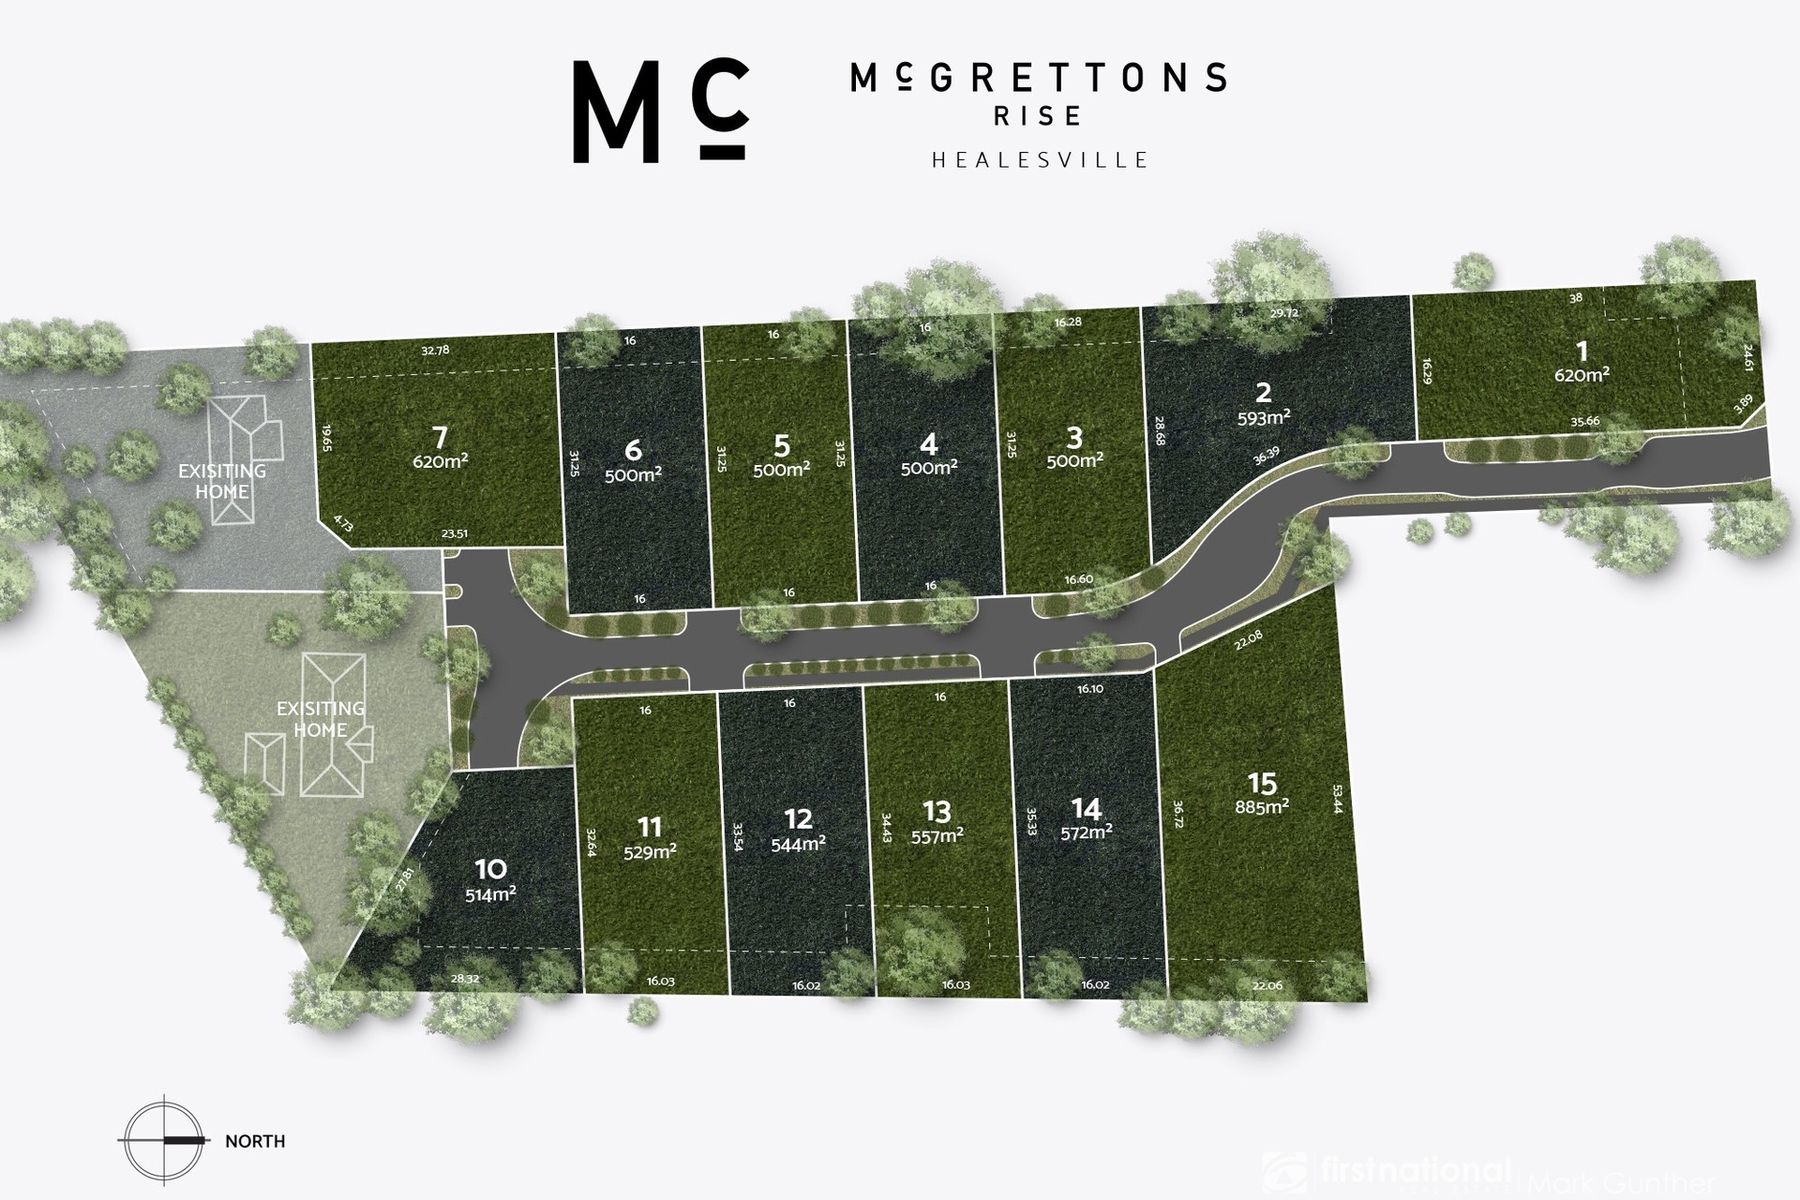 Lot 1/29 Mcgrettons Road, Healesville, VIC 3777